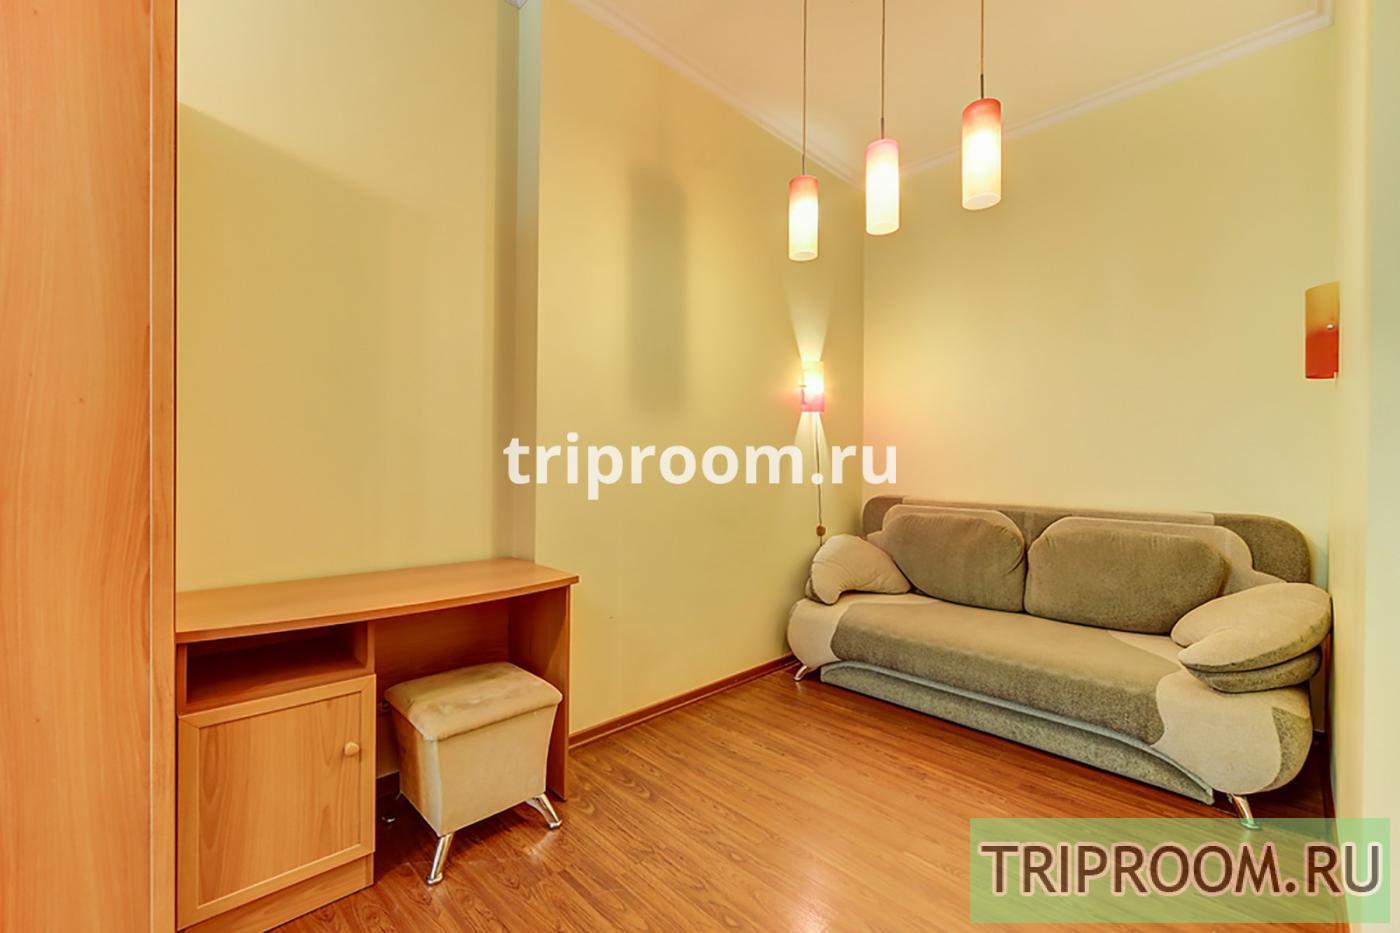 1-комнатная квартира посуточно (вариант № 15527), ул. Канала Грибоедова набережная, фото № 12